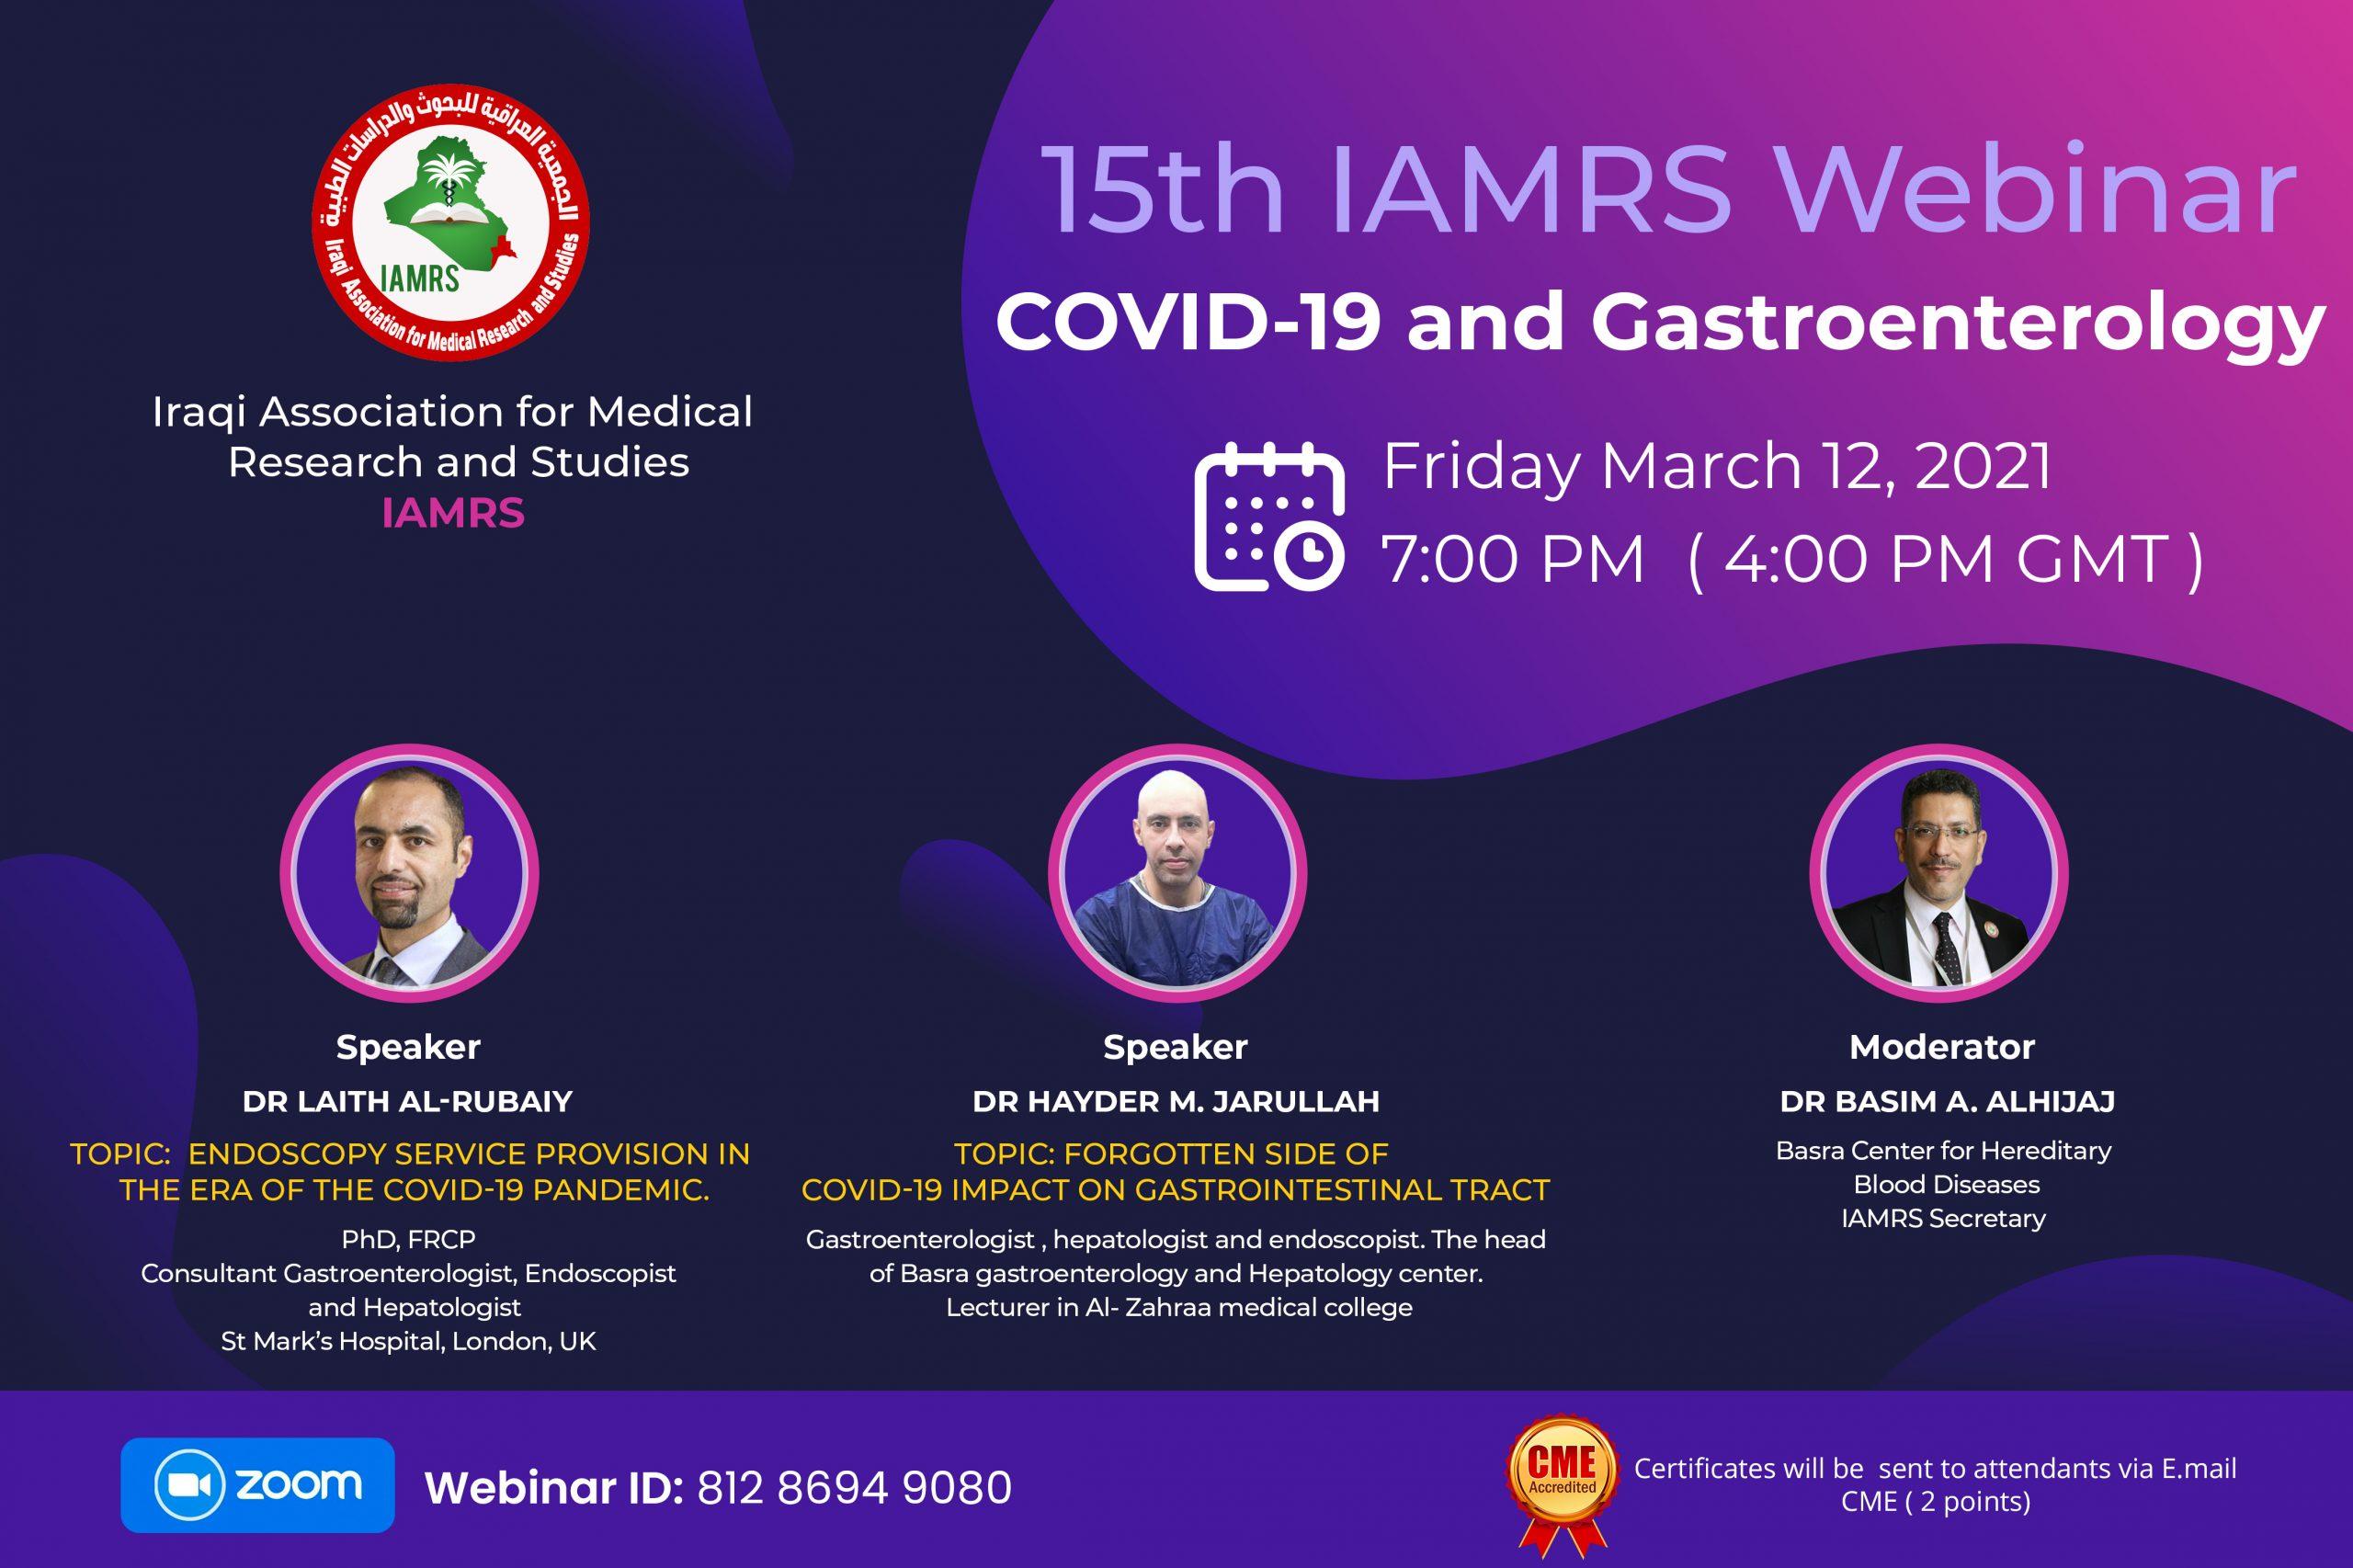 15th IAMRS Webinar